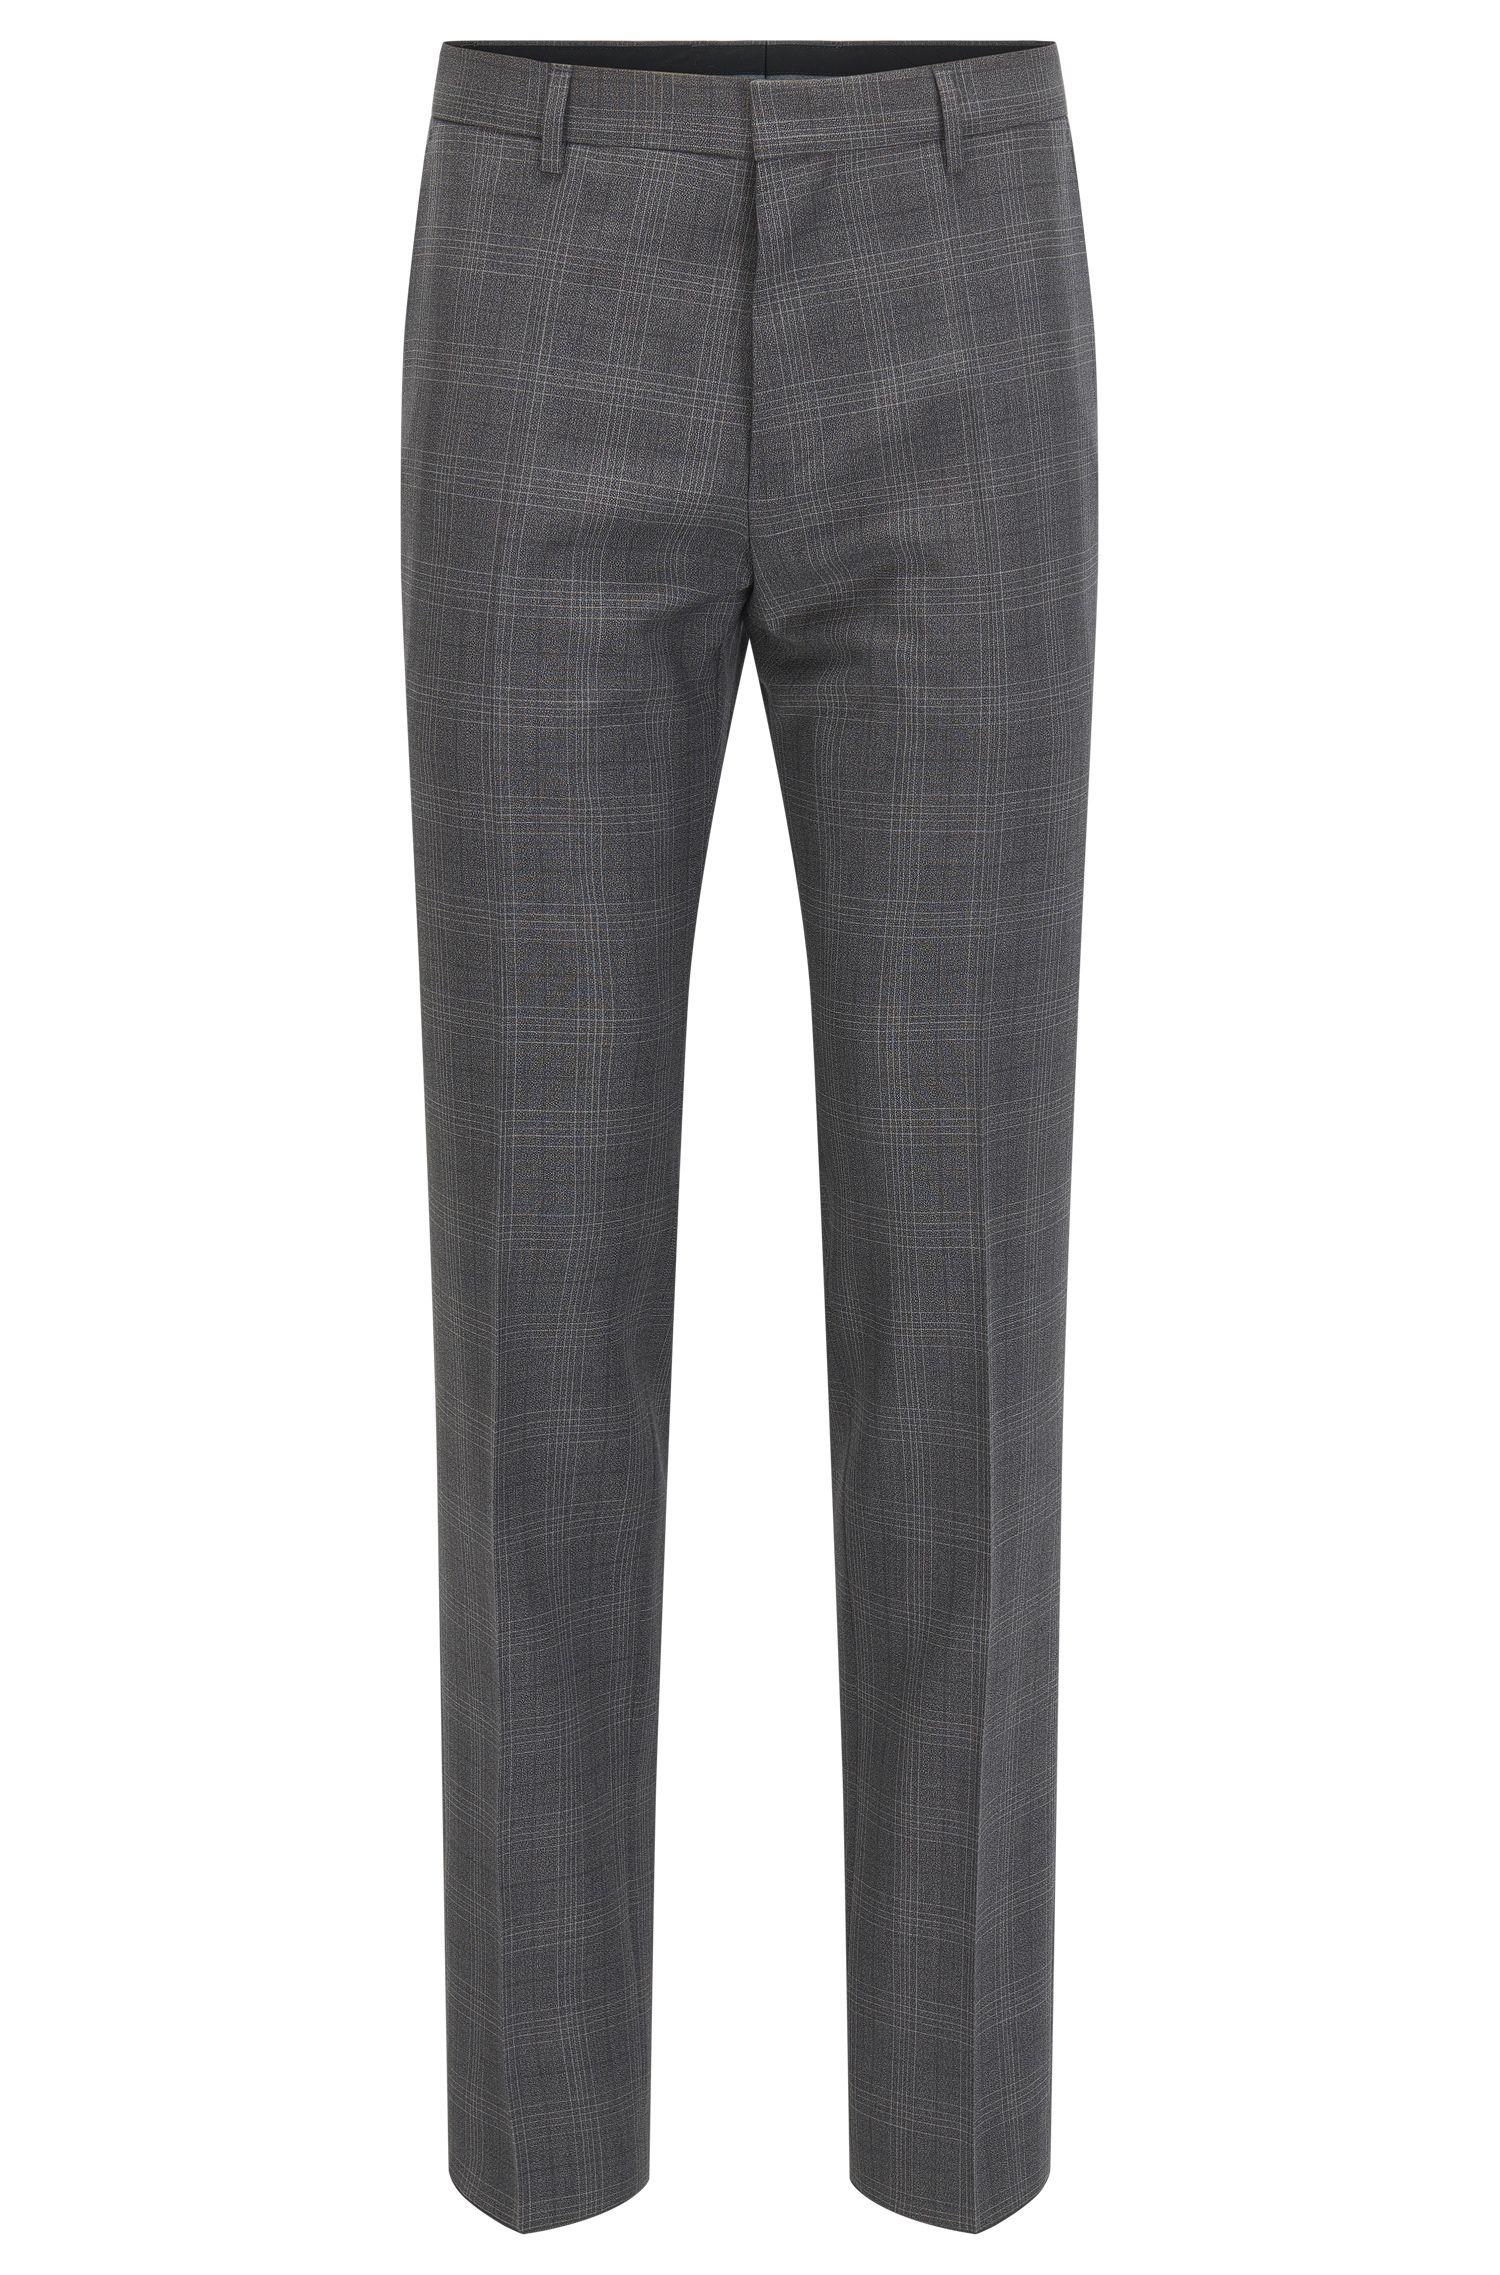 Glen Check Virgin Wool Dress Pant, Slim Fit | Genesis, Charcoal